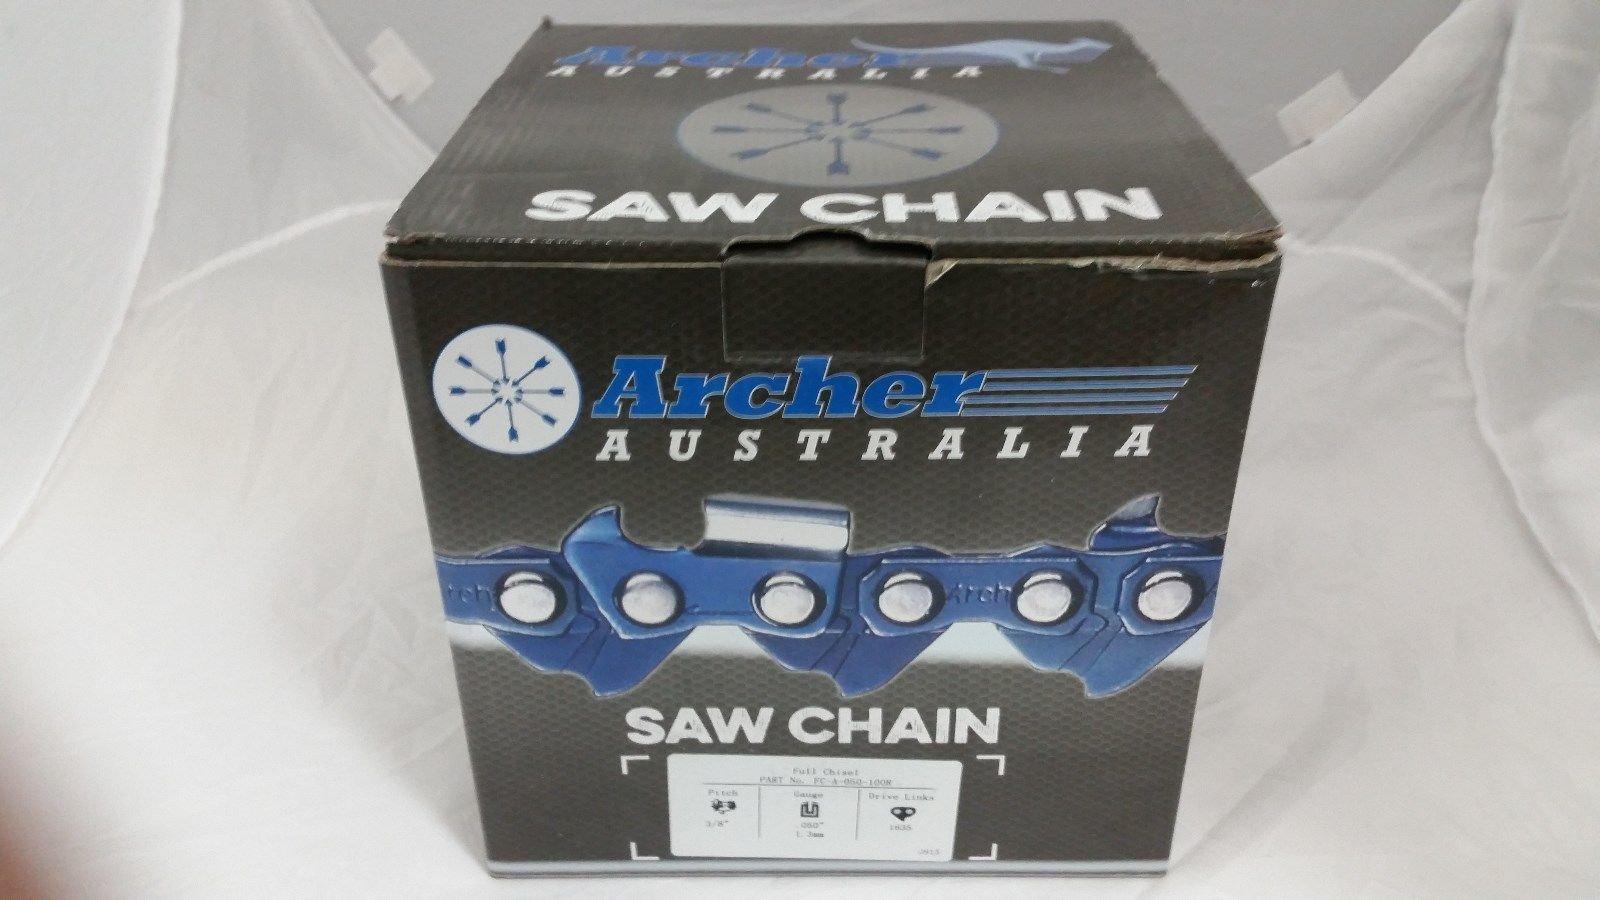 Archer Chainsaw Chain 100ft Roll 3/8'' .050 Chisel Chainsaw Chain